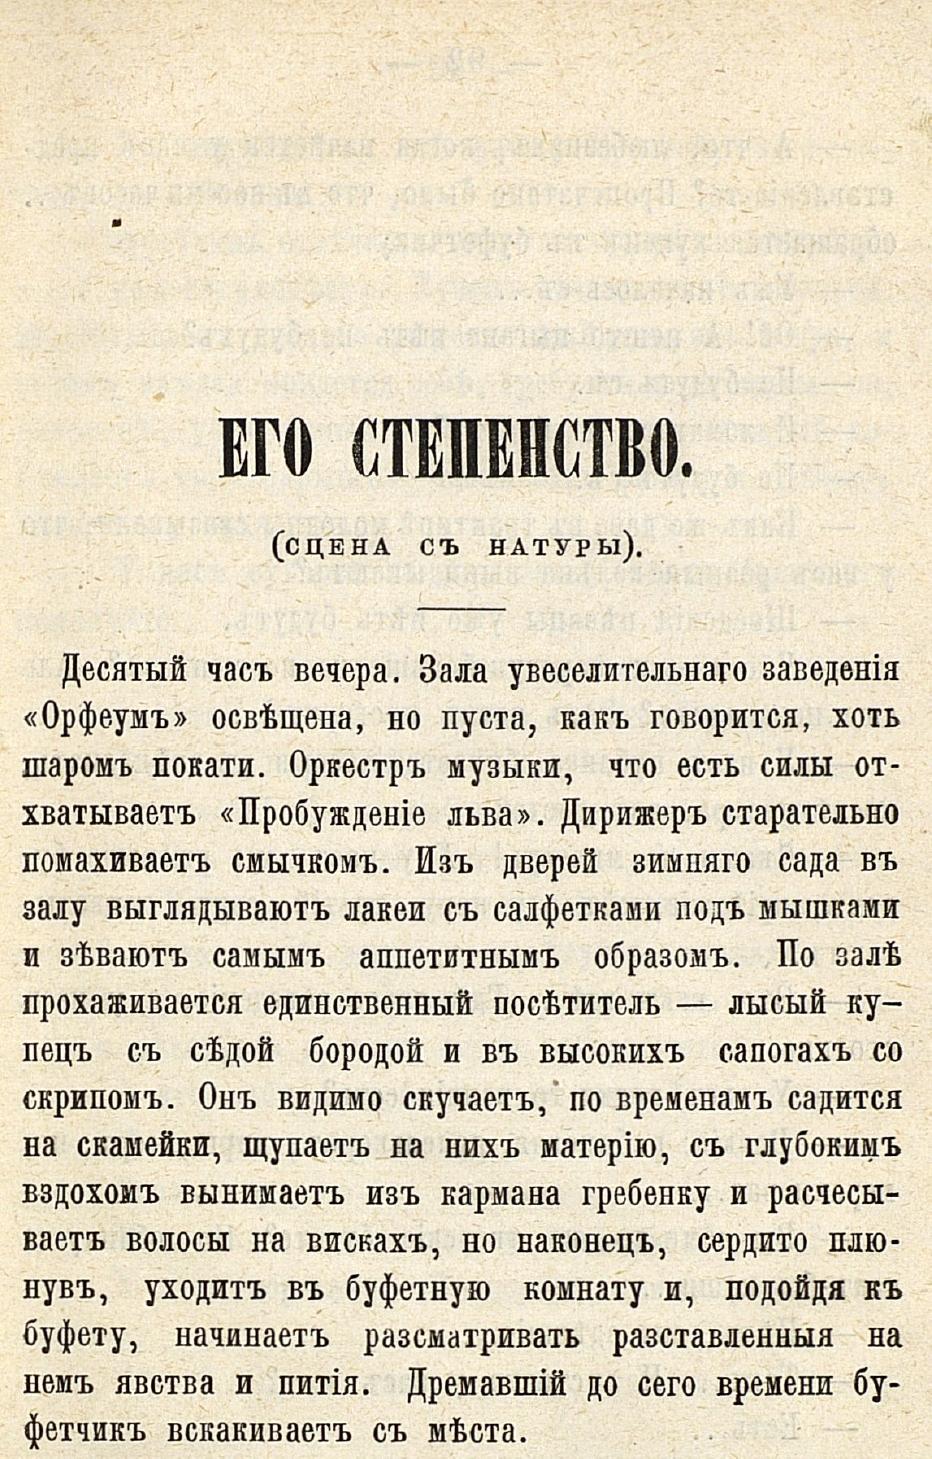 http://images.vfl.ru/ii/1406813665/06cbceb5/5858583.jpg